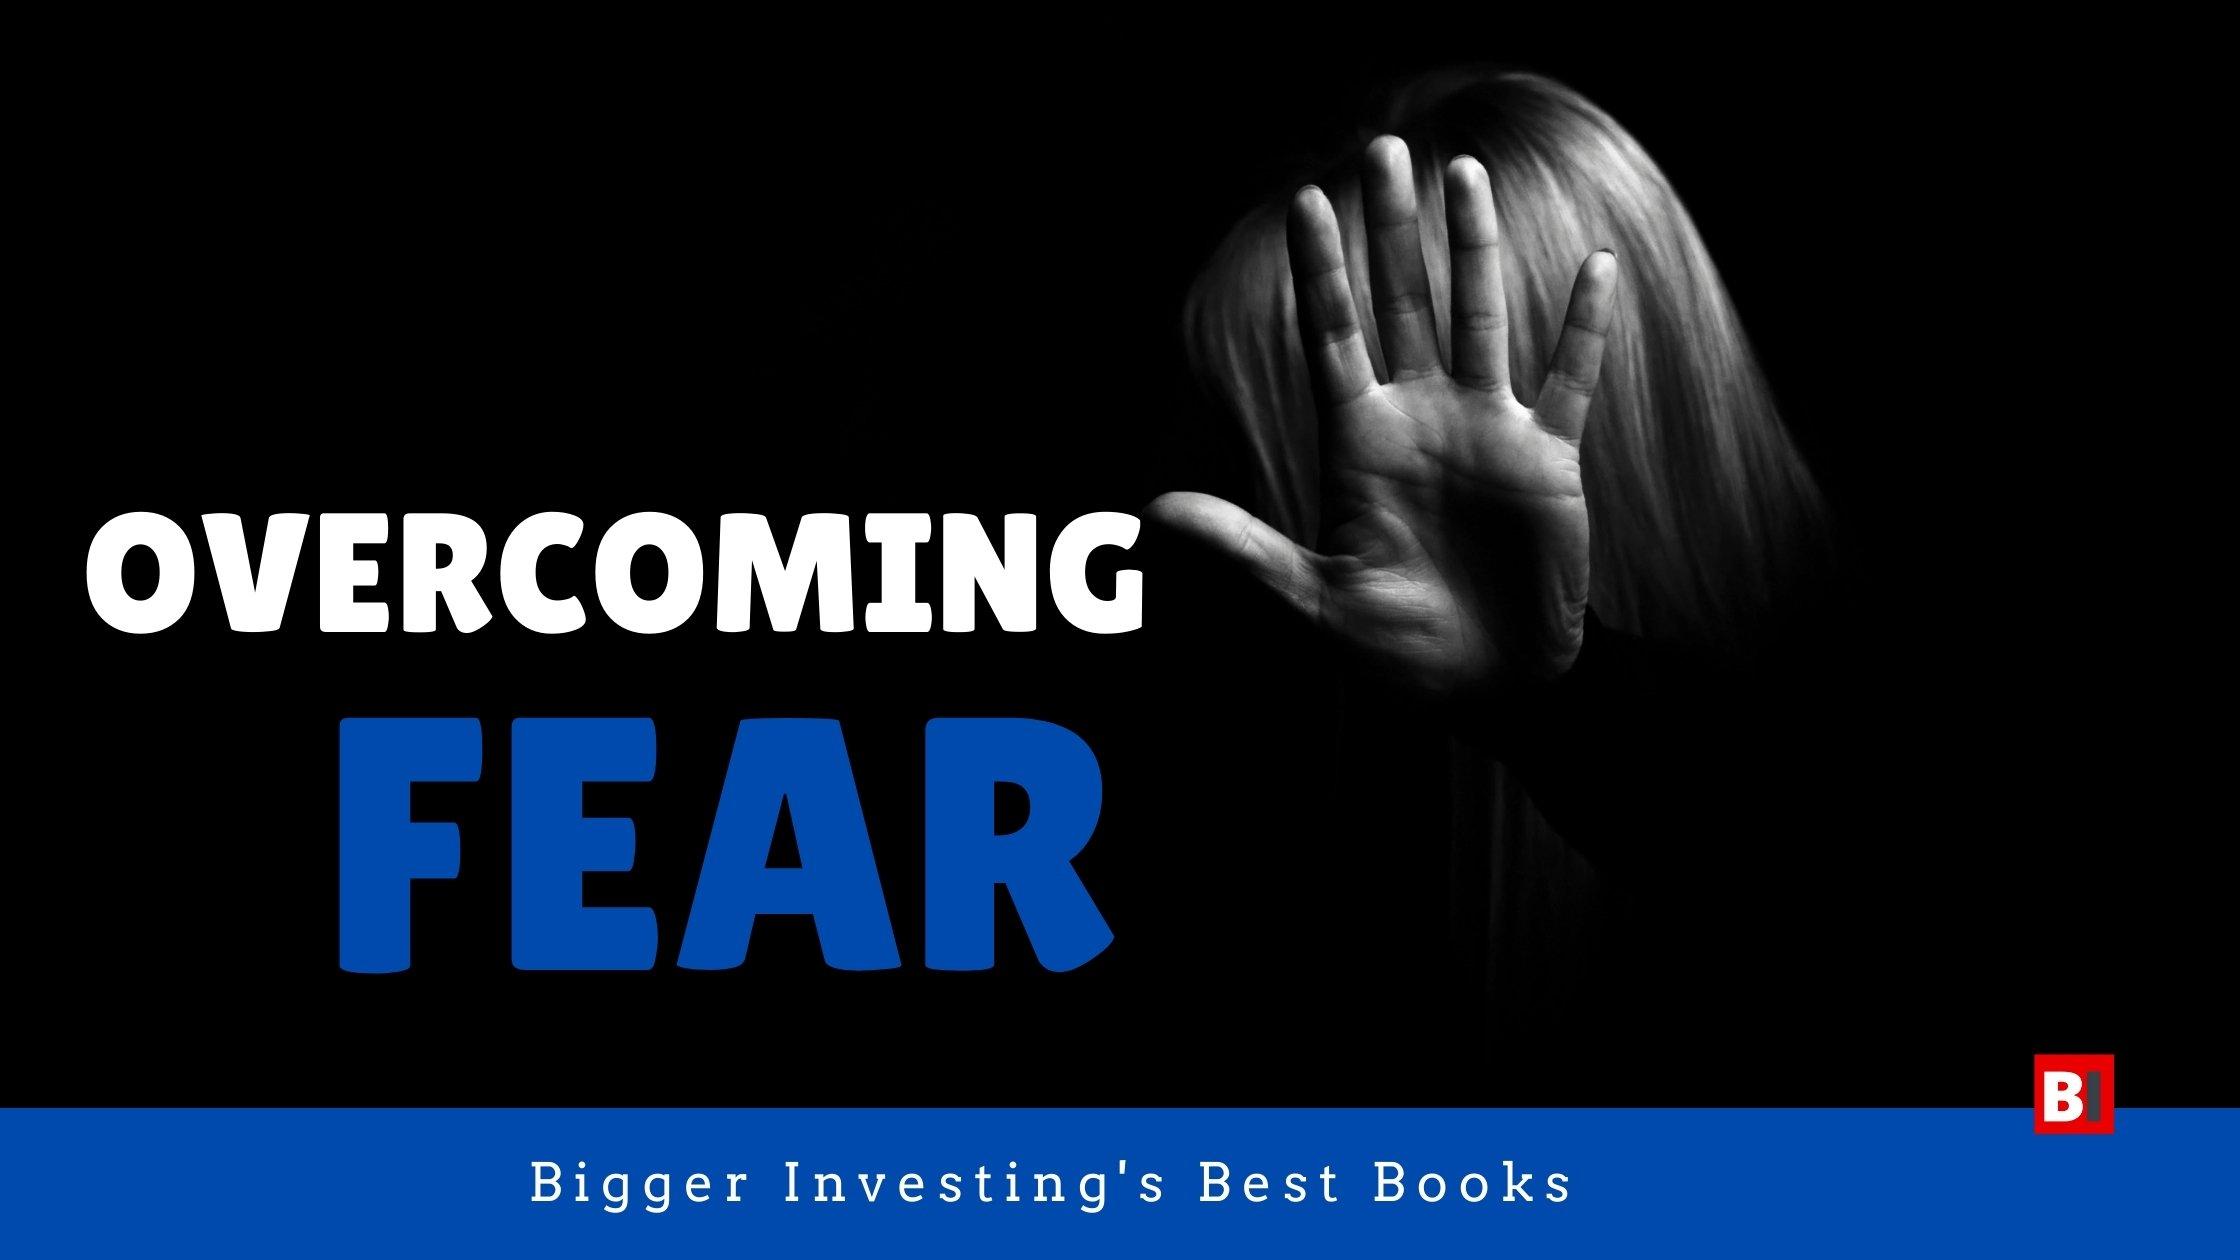 Best Books on Overcoming Fear